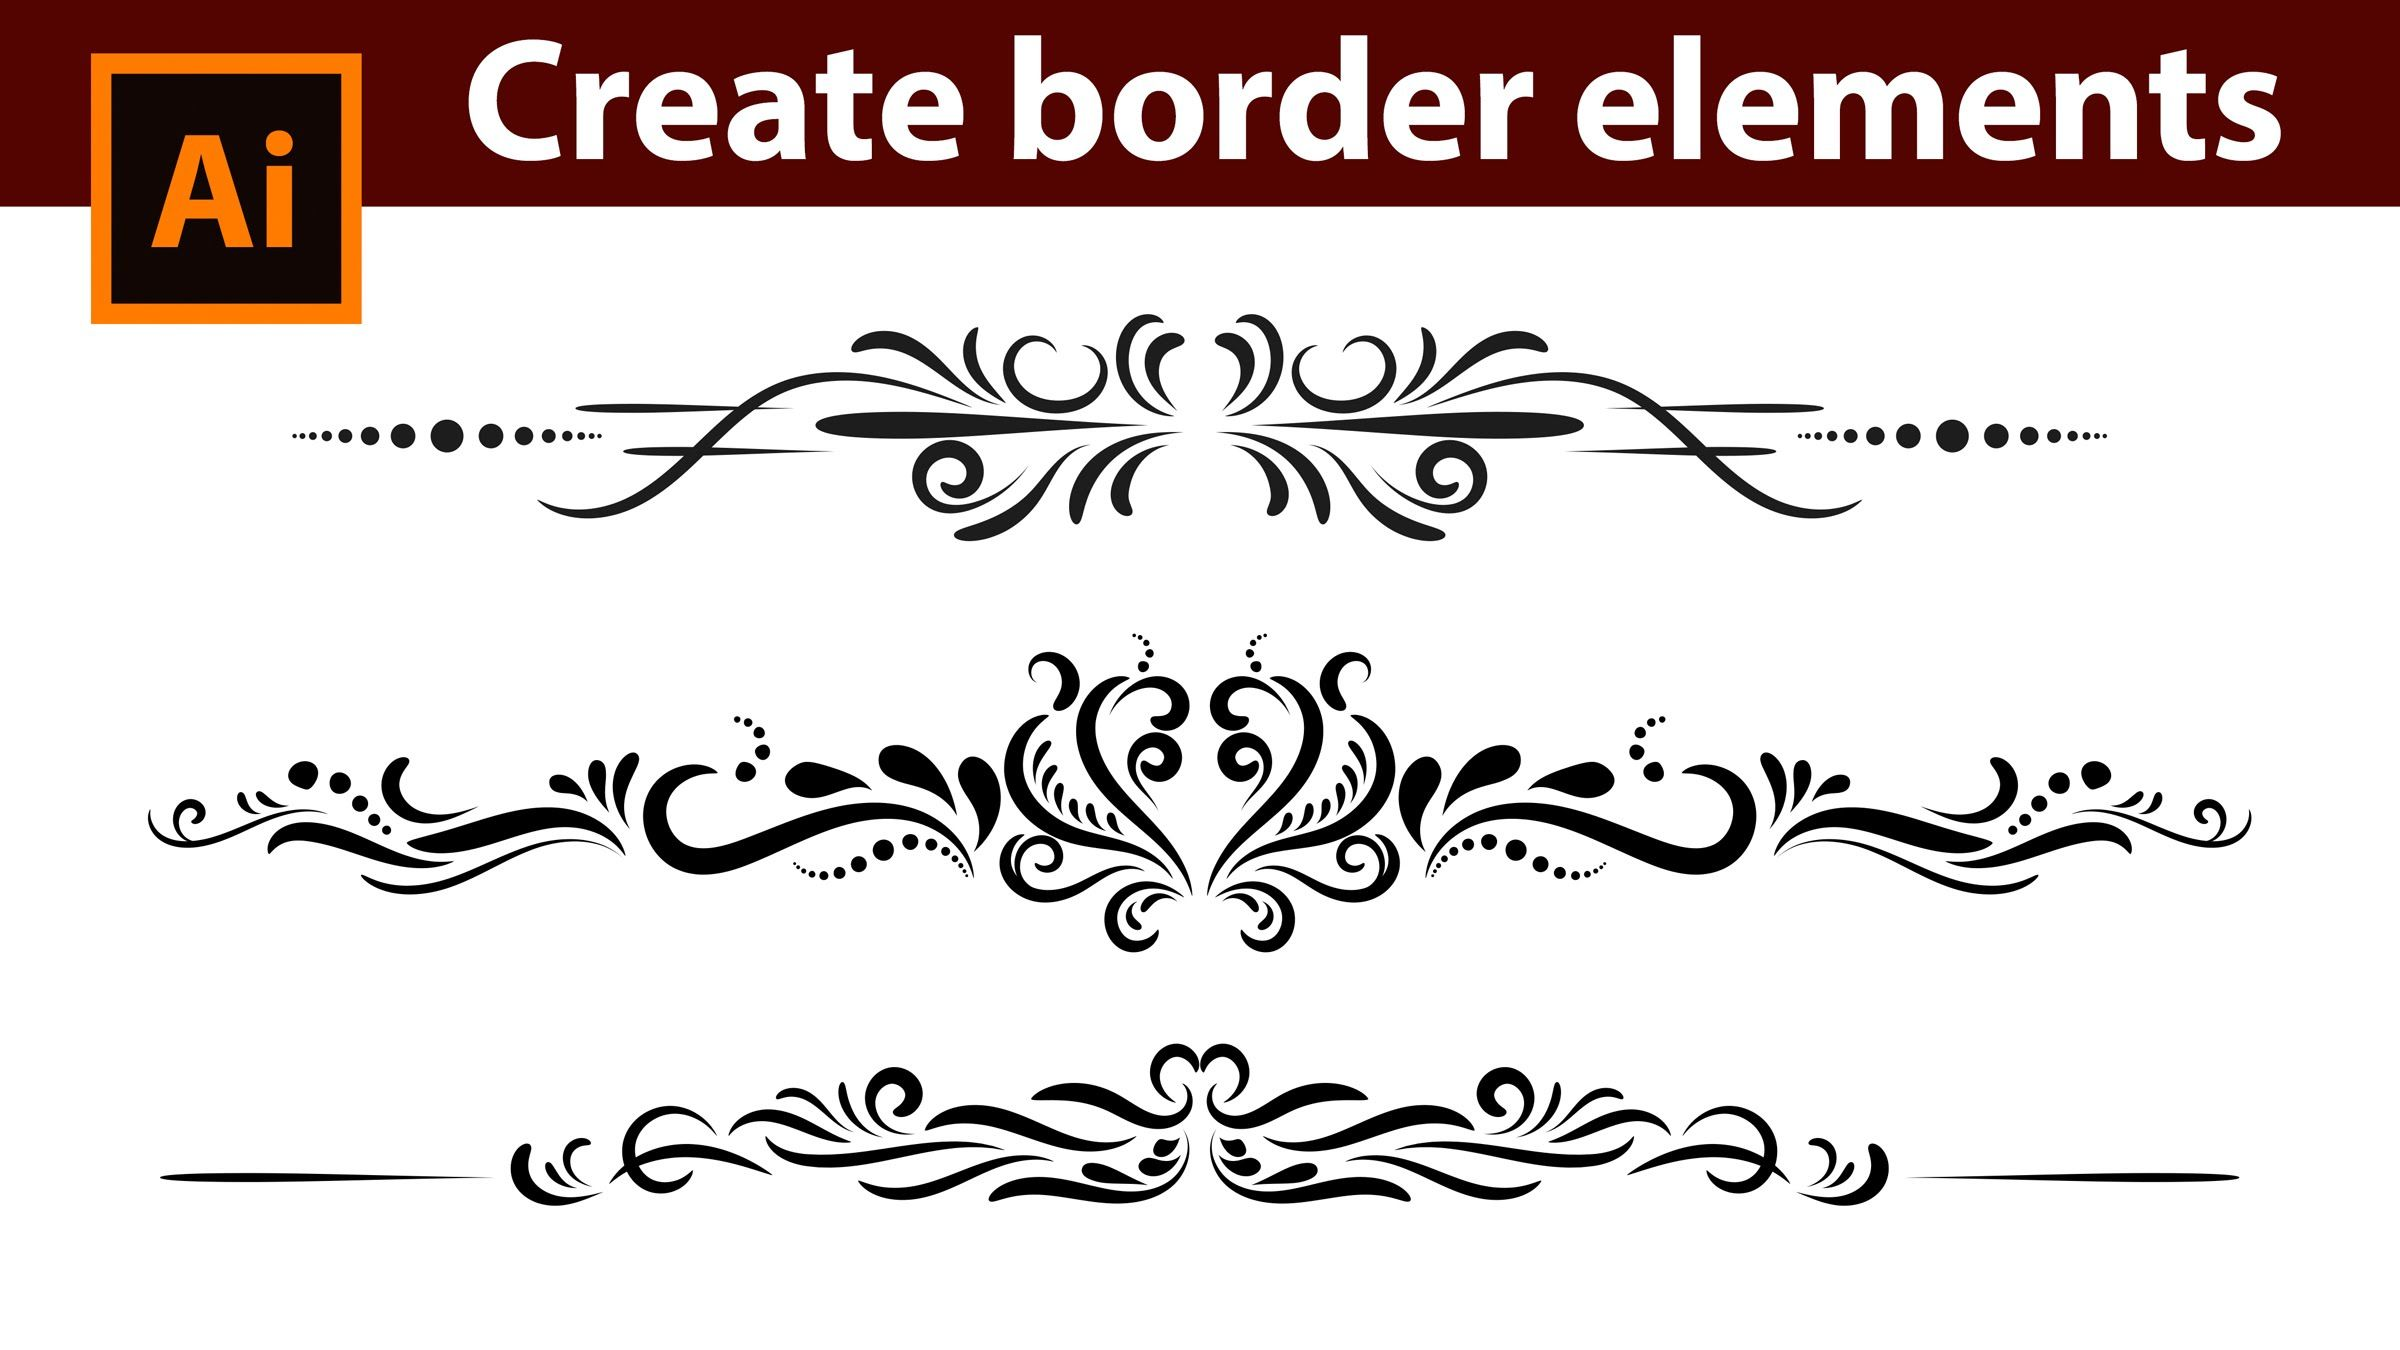 Adobe Illustrator Tutorial How To Design Vintage Border Elements Illustrator Tutorials Graphic Design Tutorials Vintage Logo Design